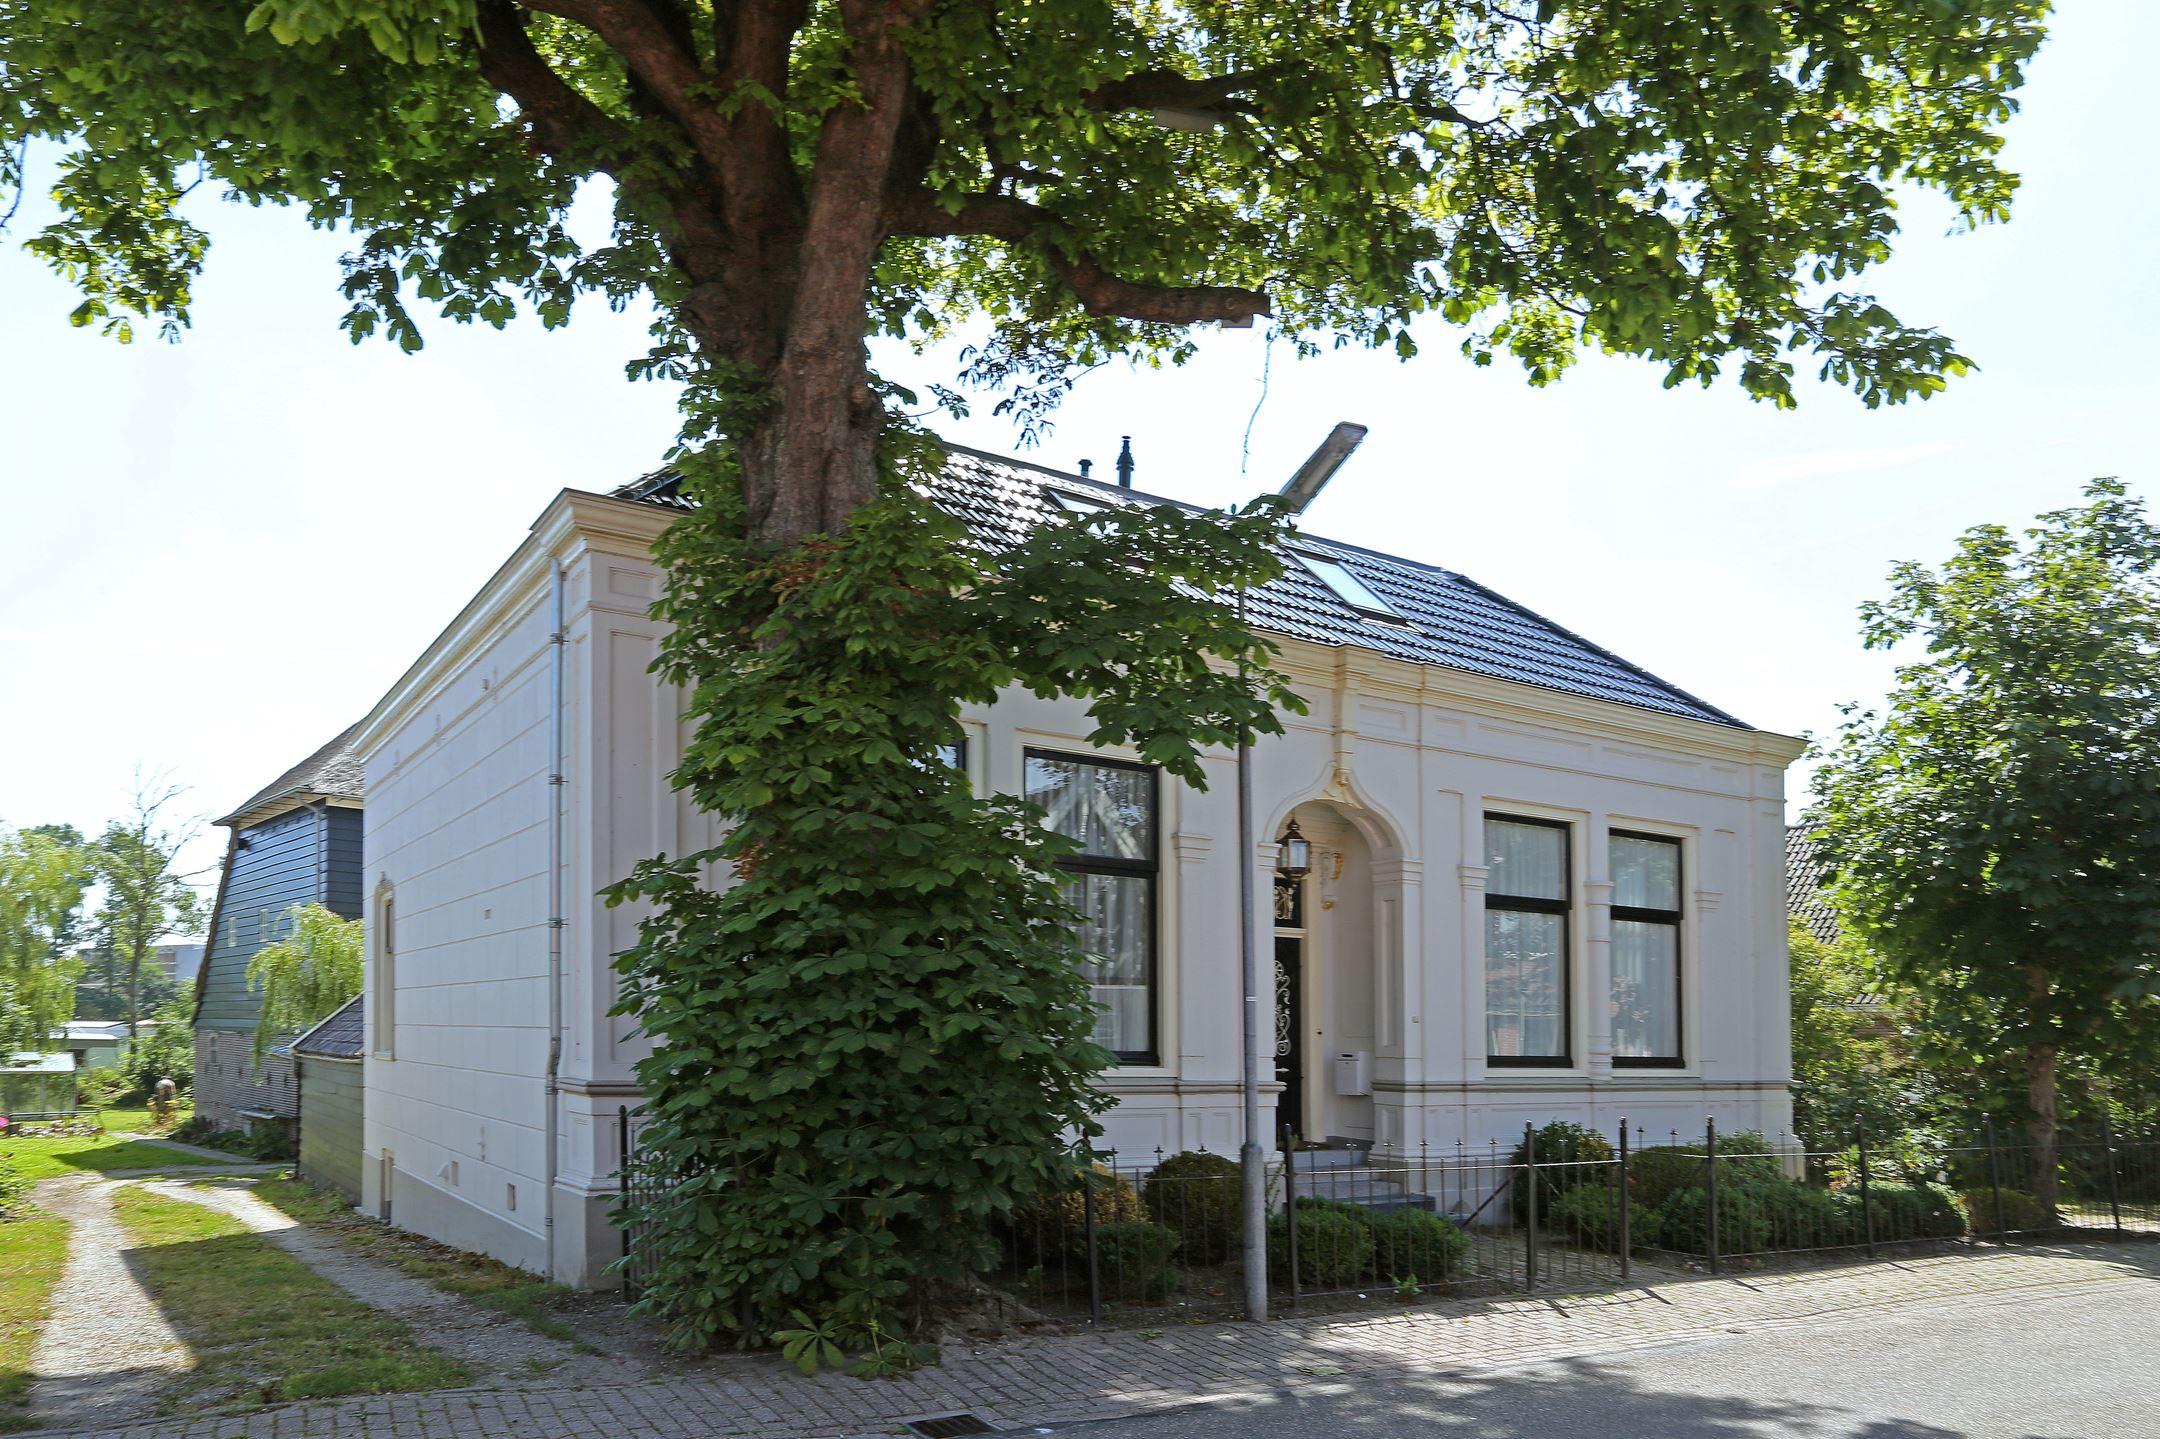 Vers inloopdouche met antieke wastafel te koop badkamermeubels ontwerpen 2017 - Huis wastafel ...